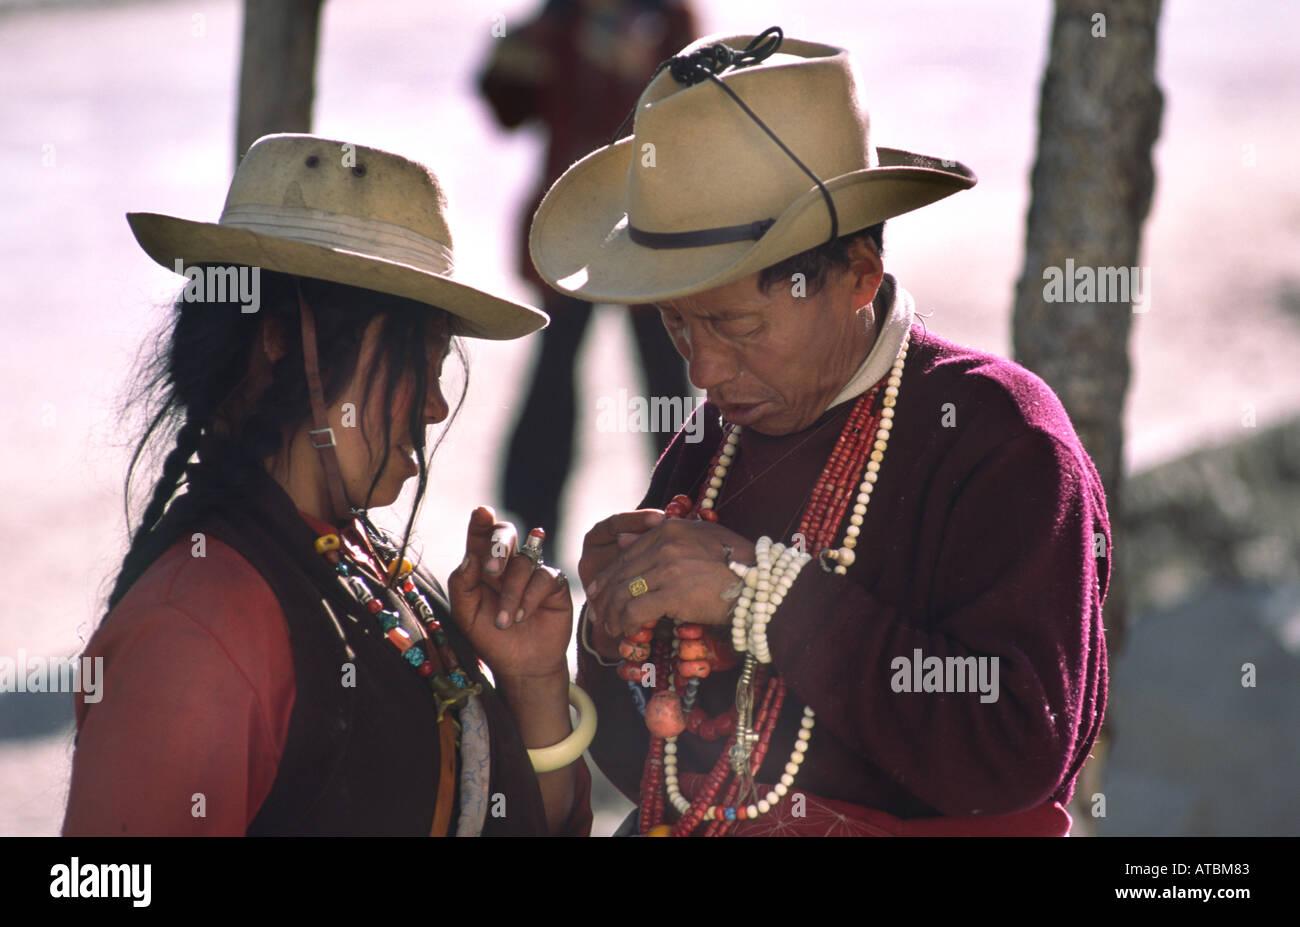 505a6ddfc Tibetan couple in Cowboy hats. Litang, Sichuan, China Stock Photo ...